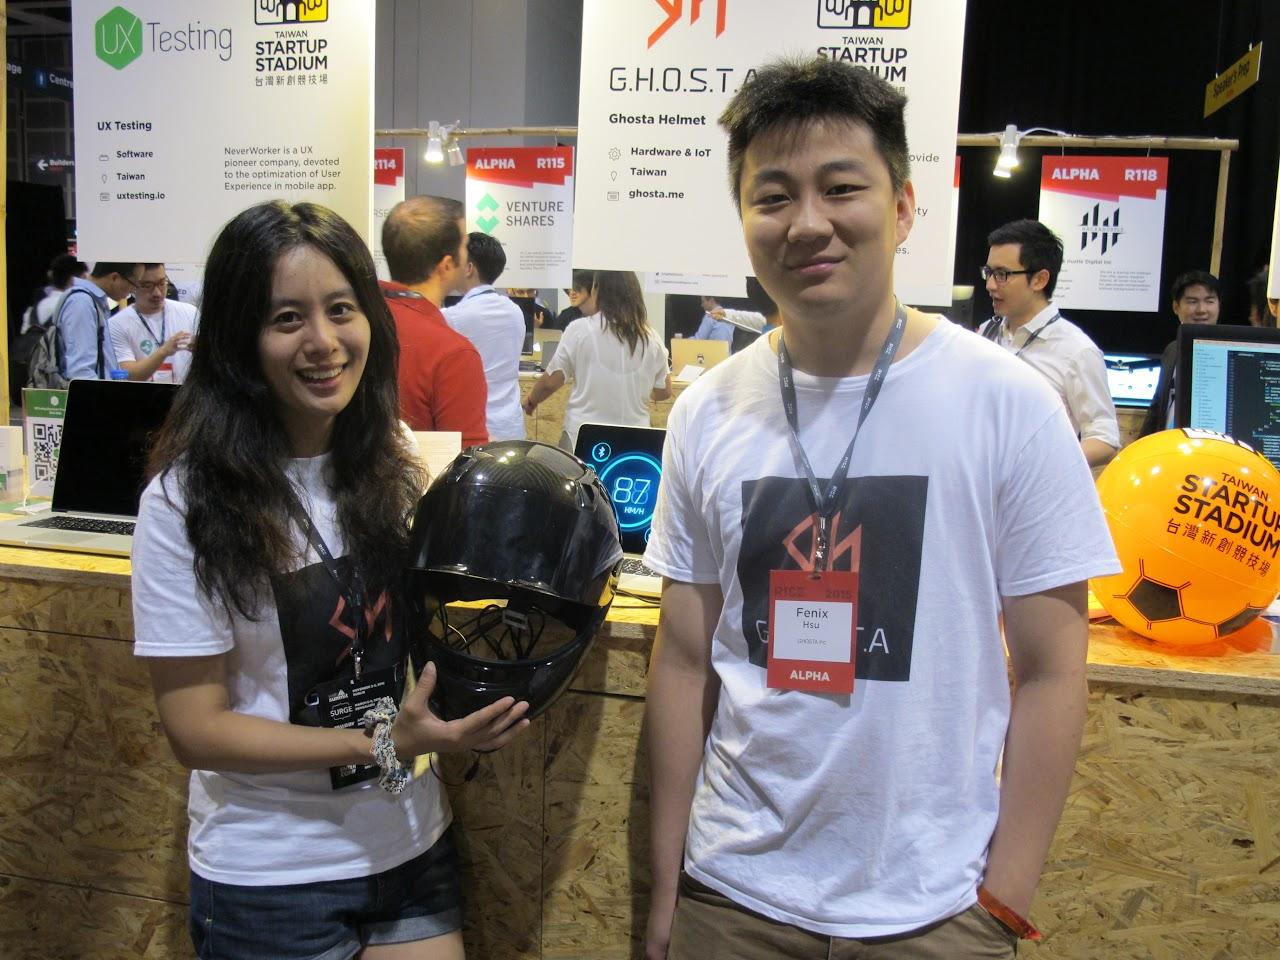 [RISE香港] 勇闖RISE,台灣新創發光(下):GHOSTA、手機醫生